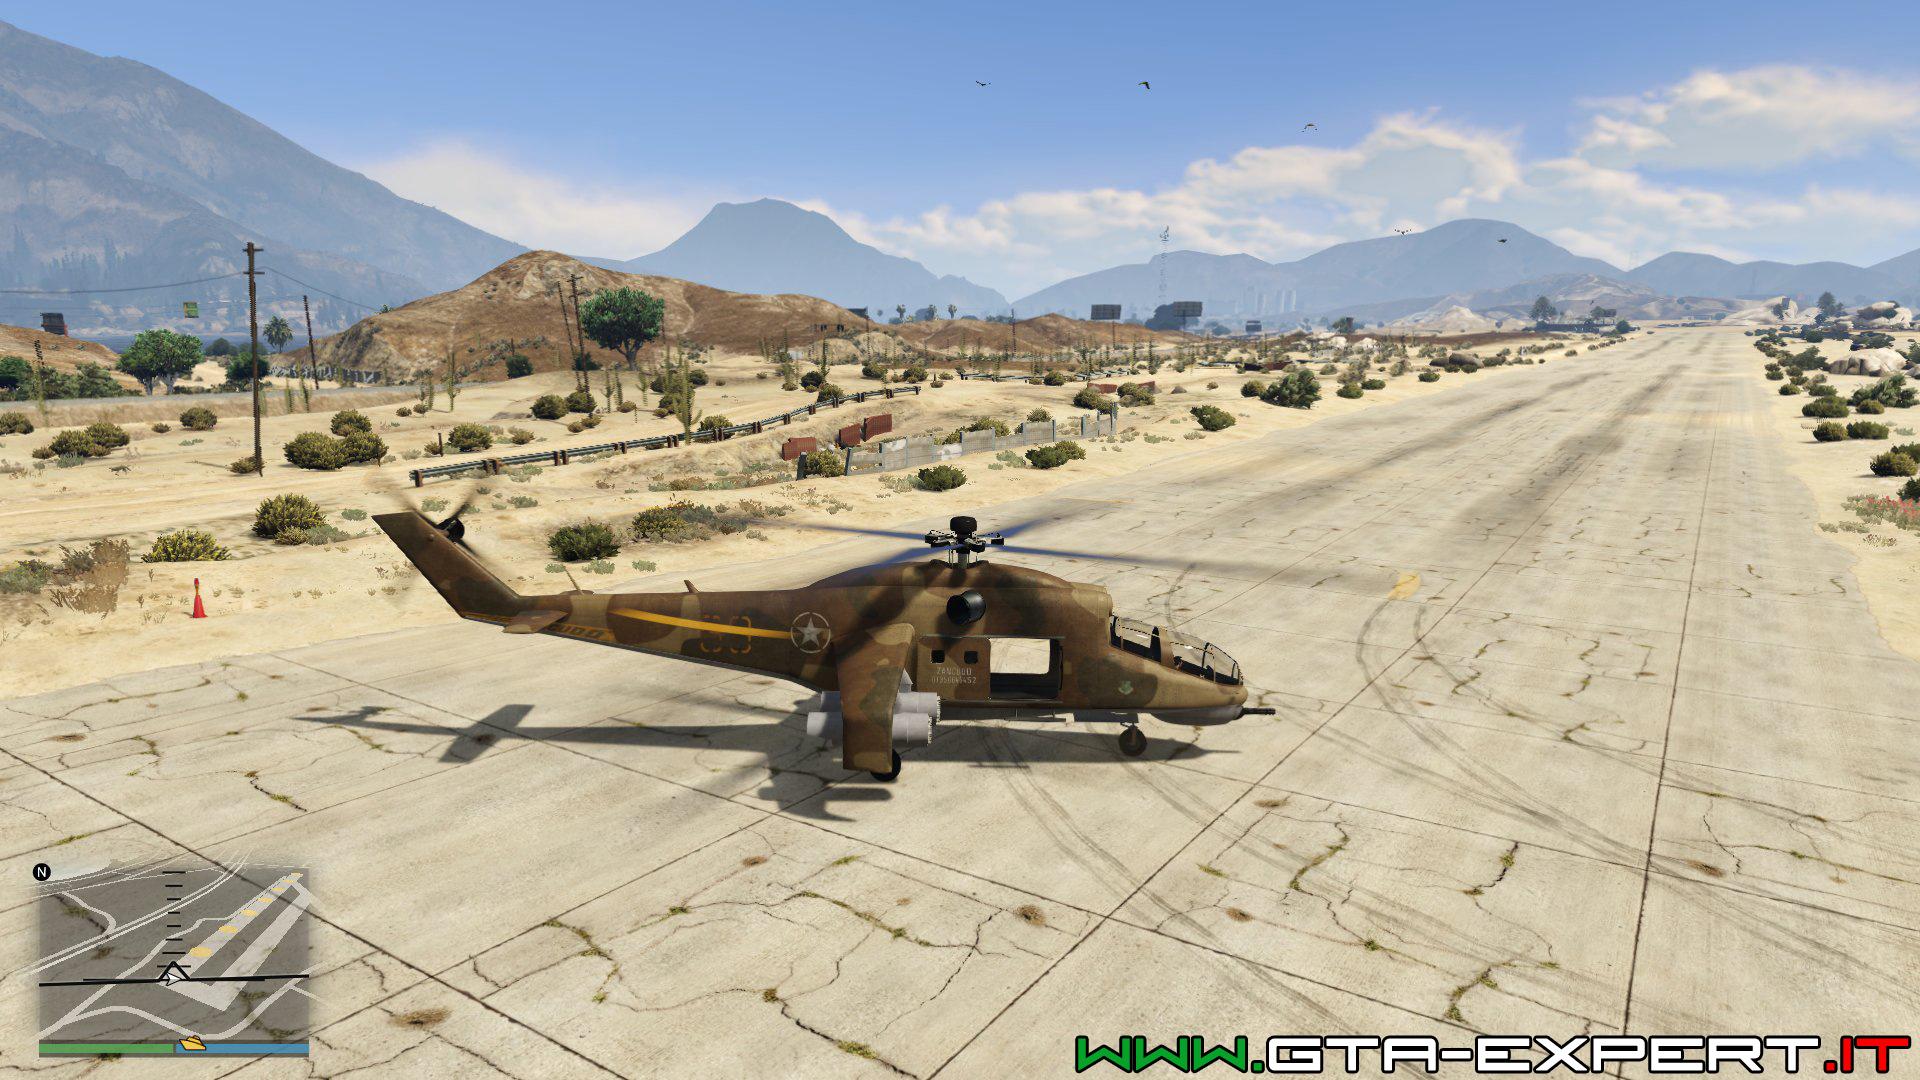 Elicottero Gta 5 : Elicotteri gta v expert